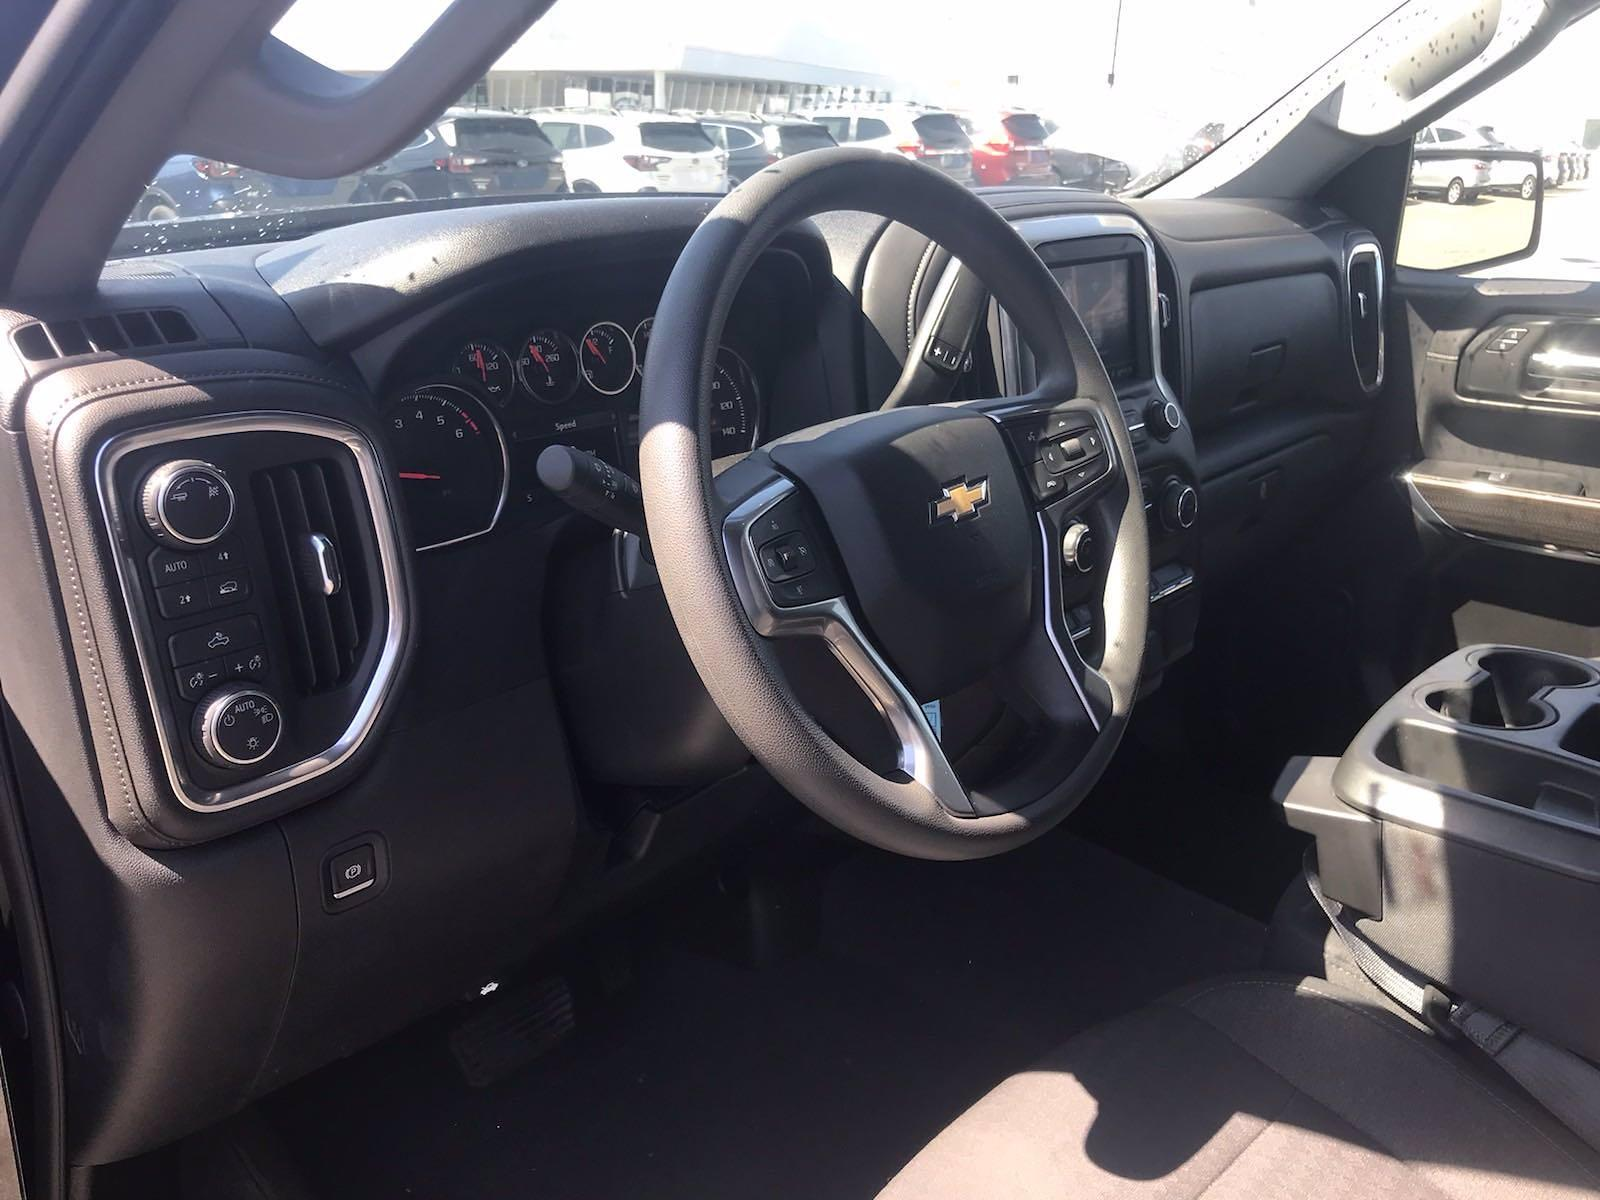 2019 Chevrolet Silverado 1500 Crew Cab 4x4, Pickup #16493PN - photo 23